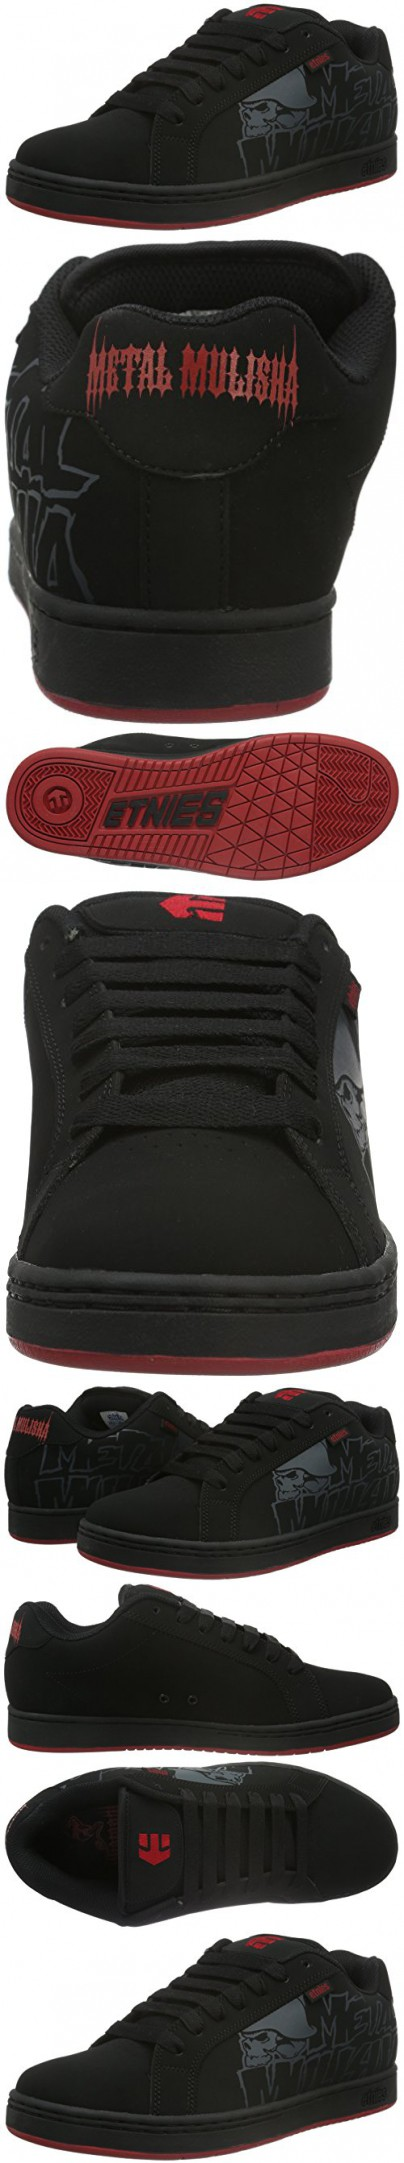 Etnies Men's Metal Mulisha Fader Skateboarding Shoe, Black/Black/Red, 10.5 M US